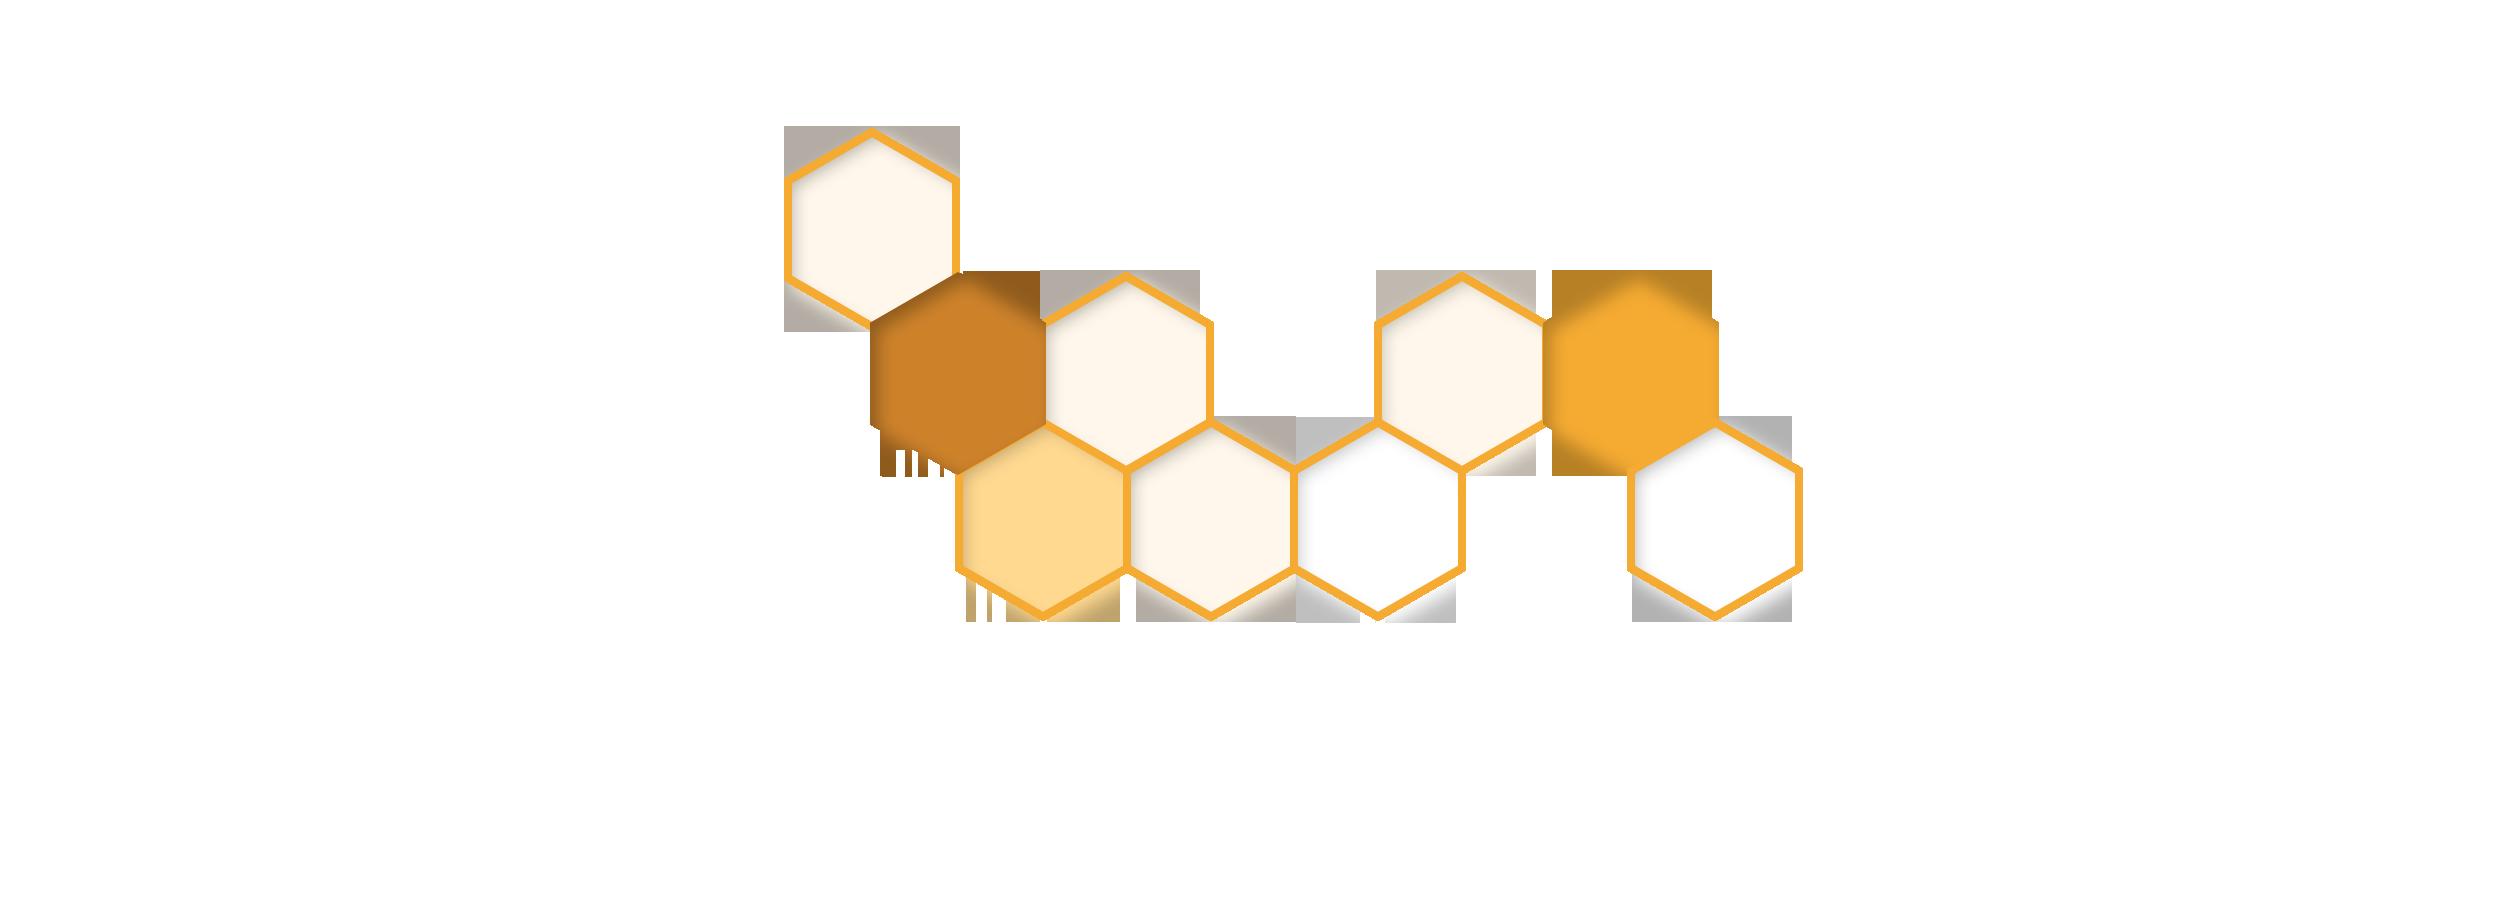 honeycomb_c7.png